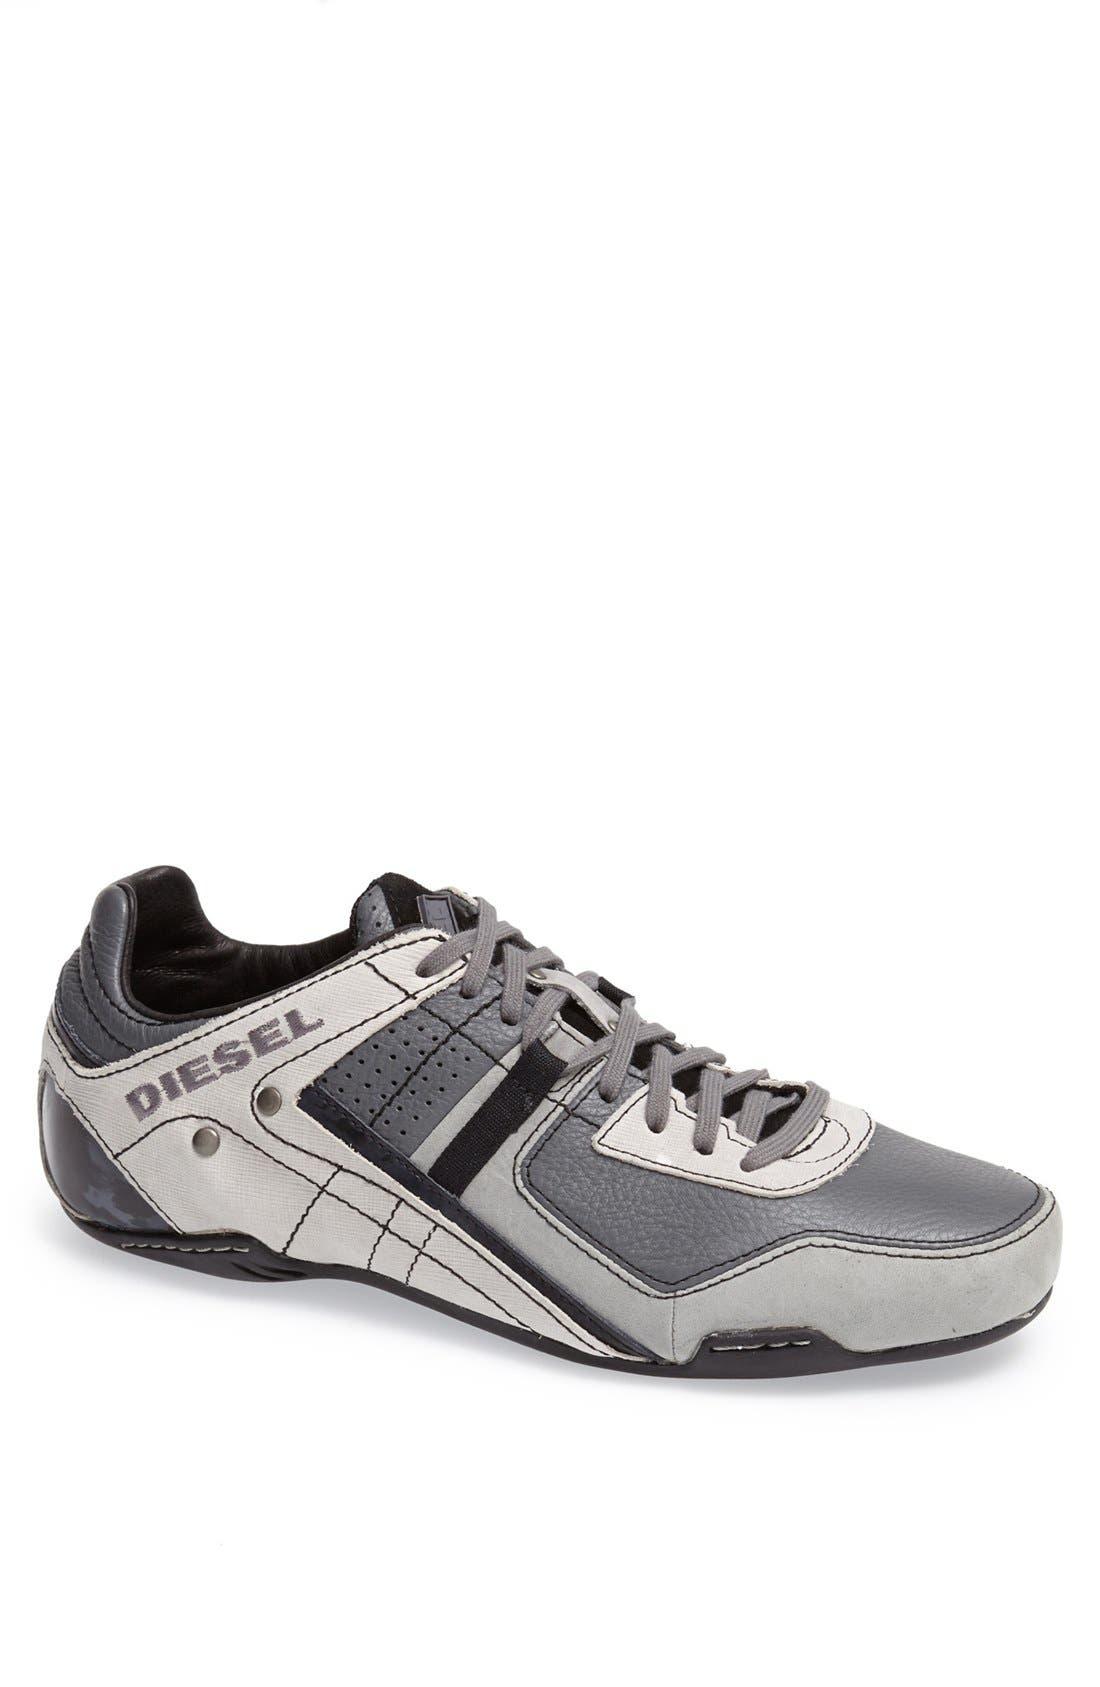 'Trackkers Korbin II' Sneaker,                             Main thumbnail 1, color,                             058